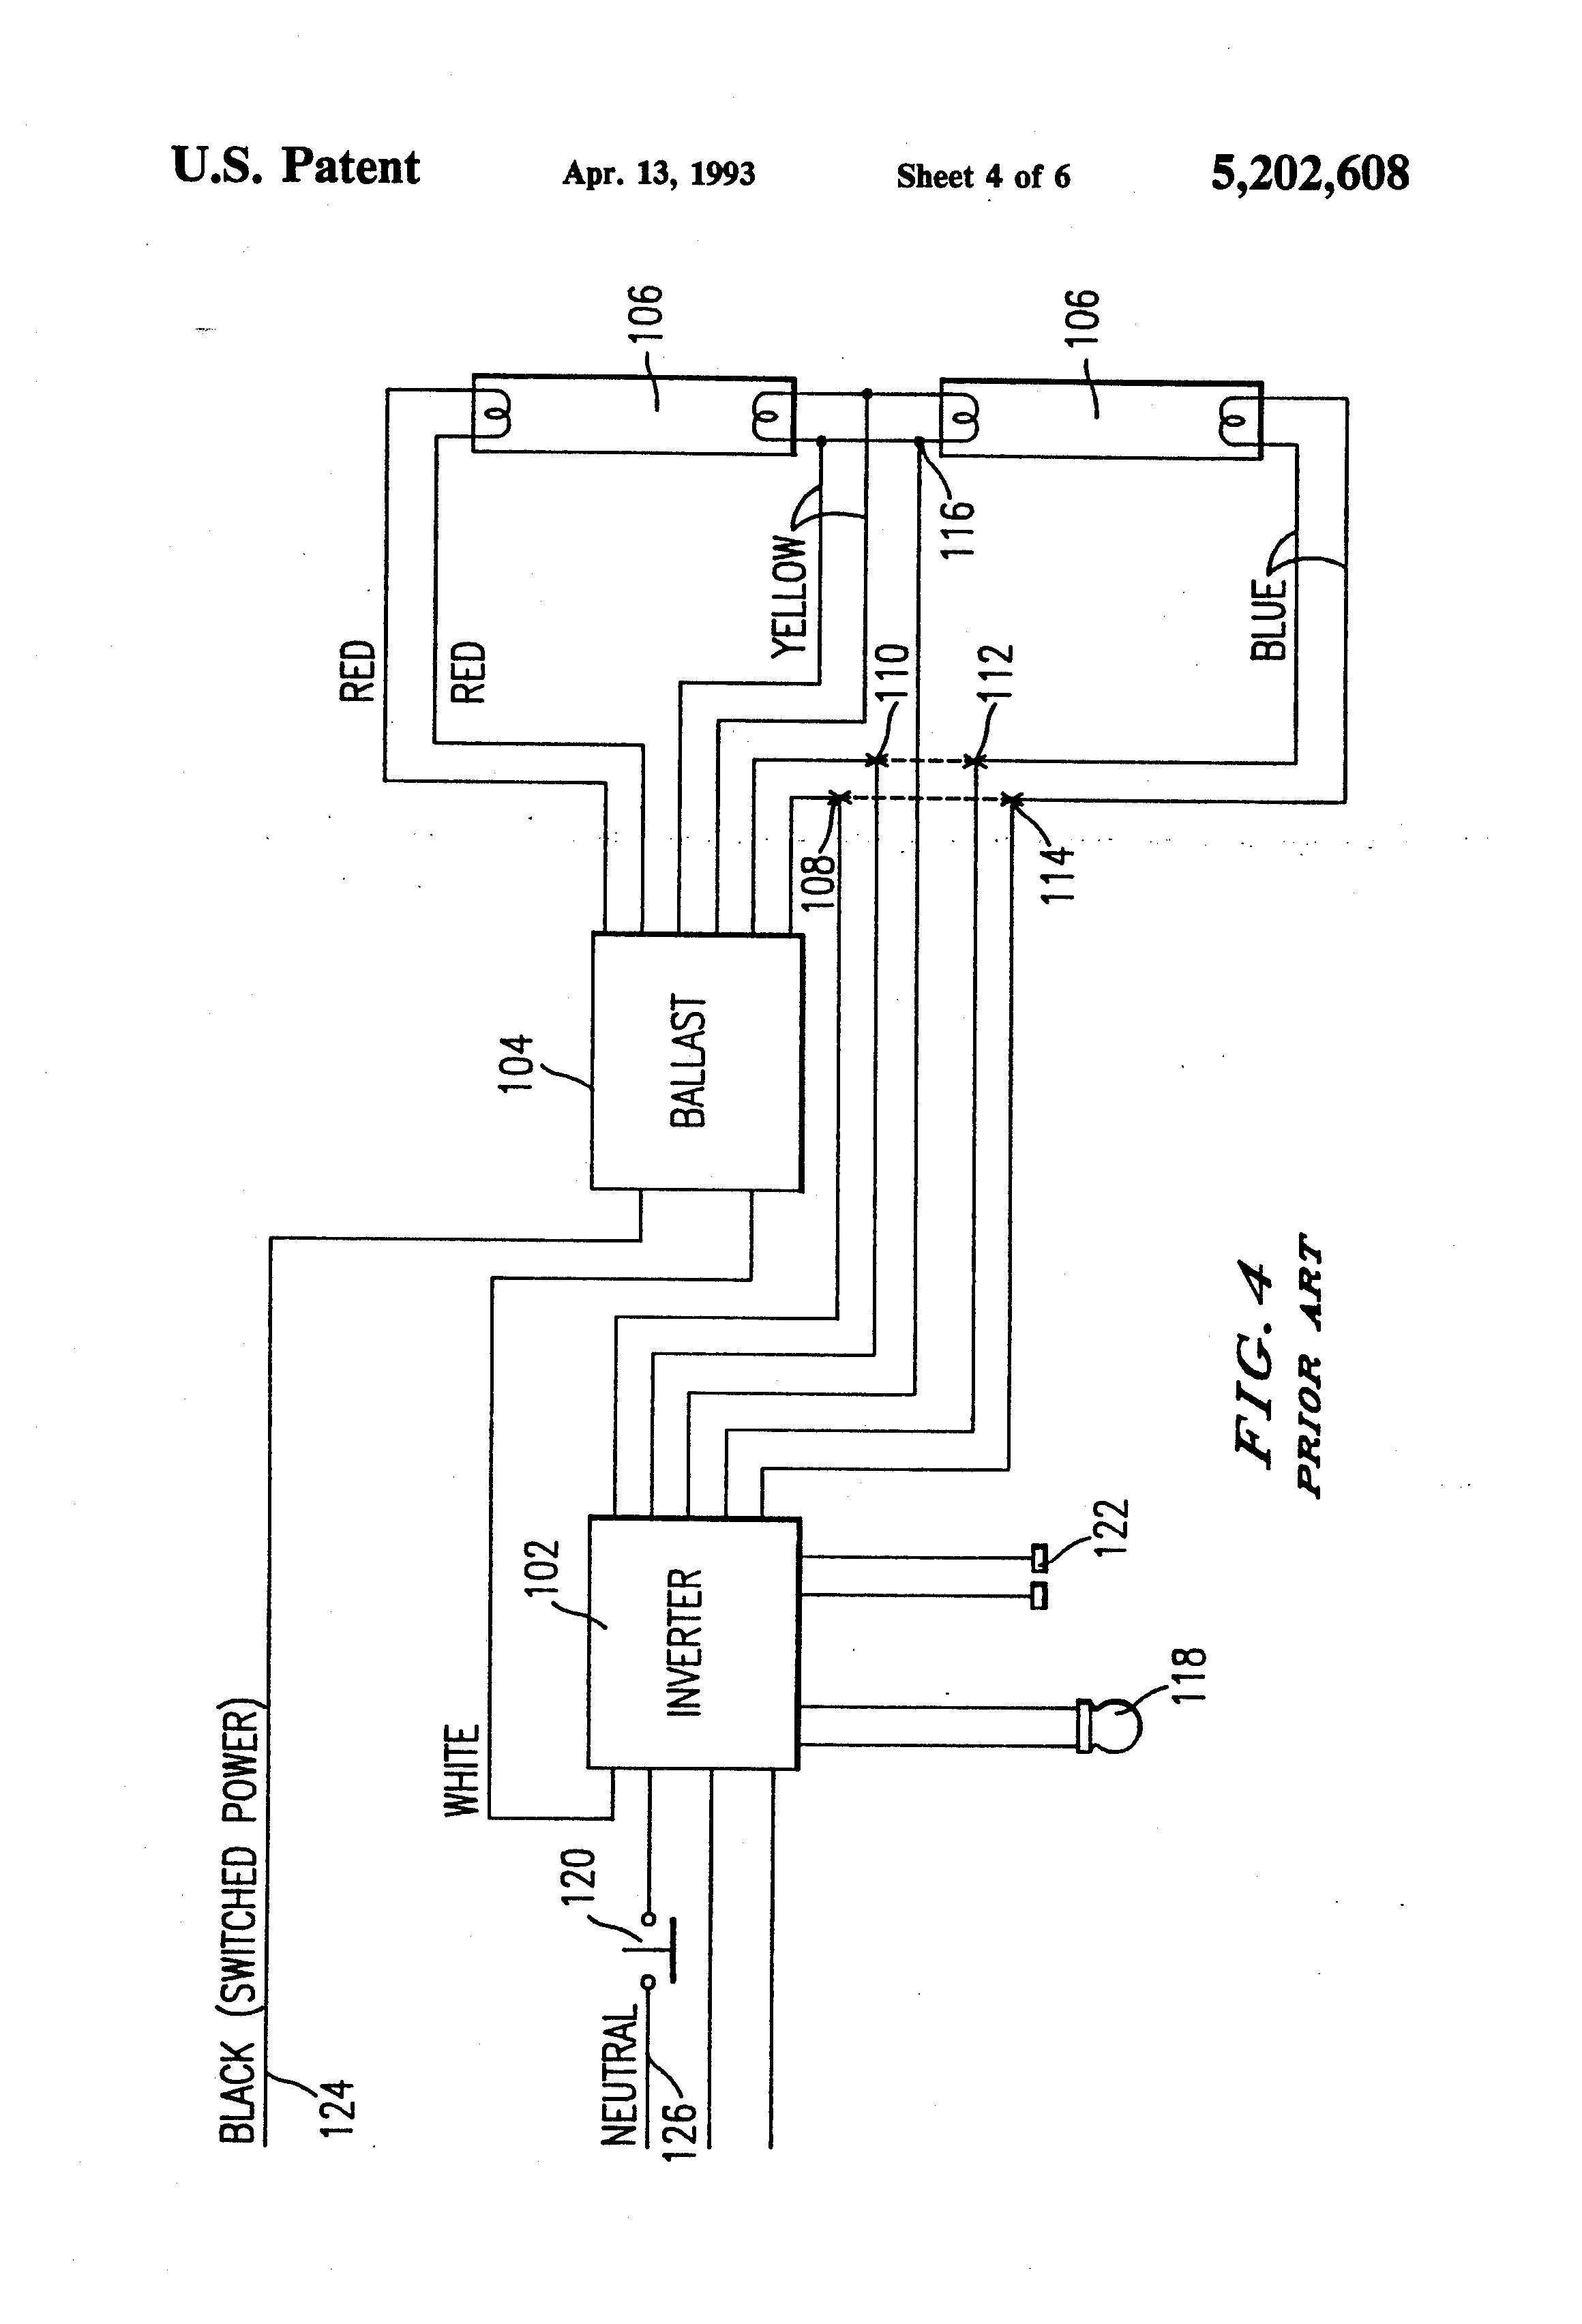 Metal Halide Wiring Schematic | Manual E-Books - Mh Ballast Wiring Diagram